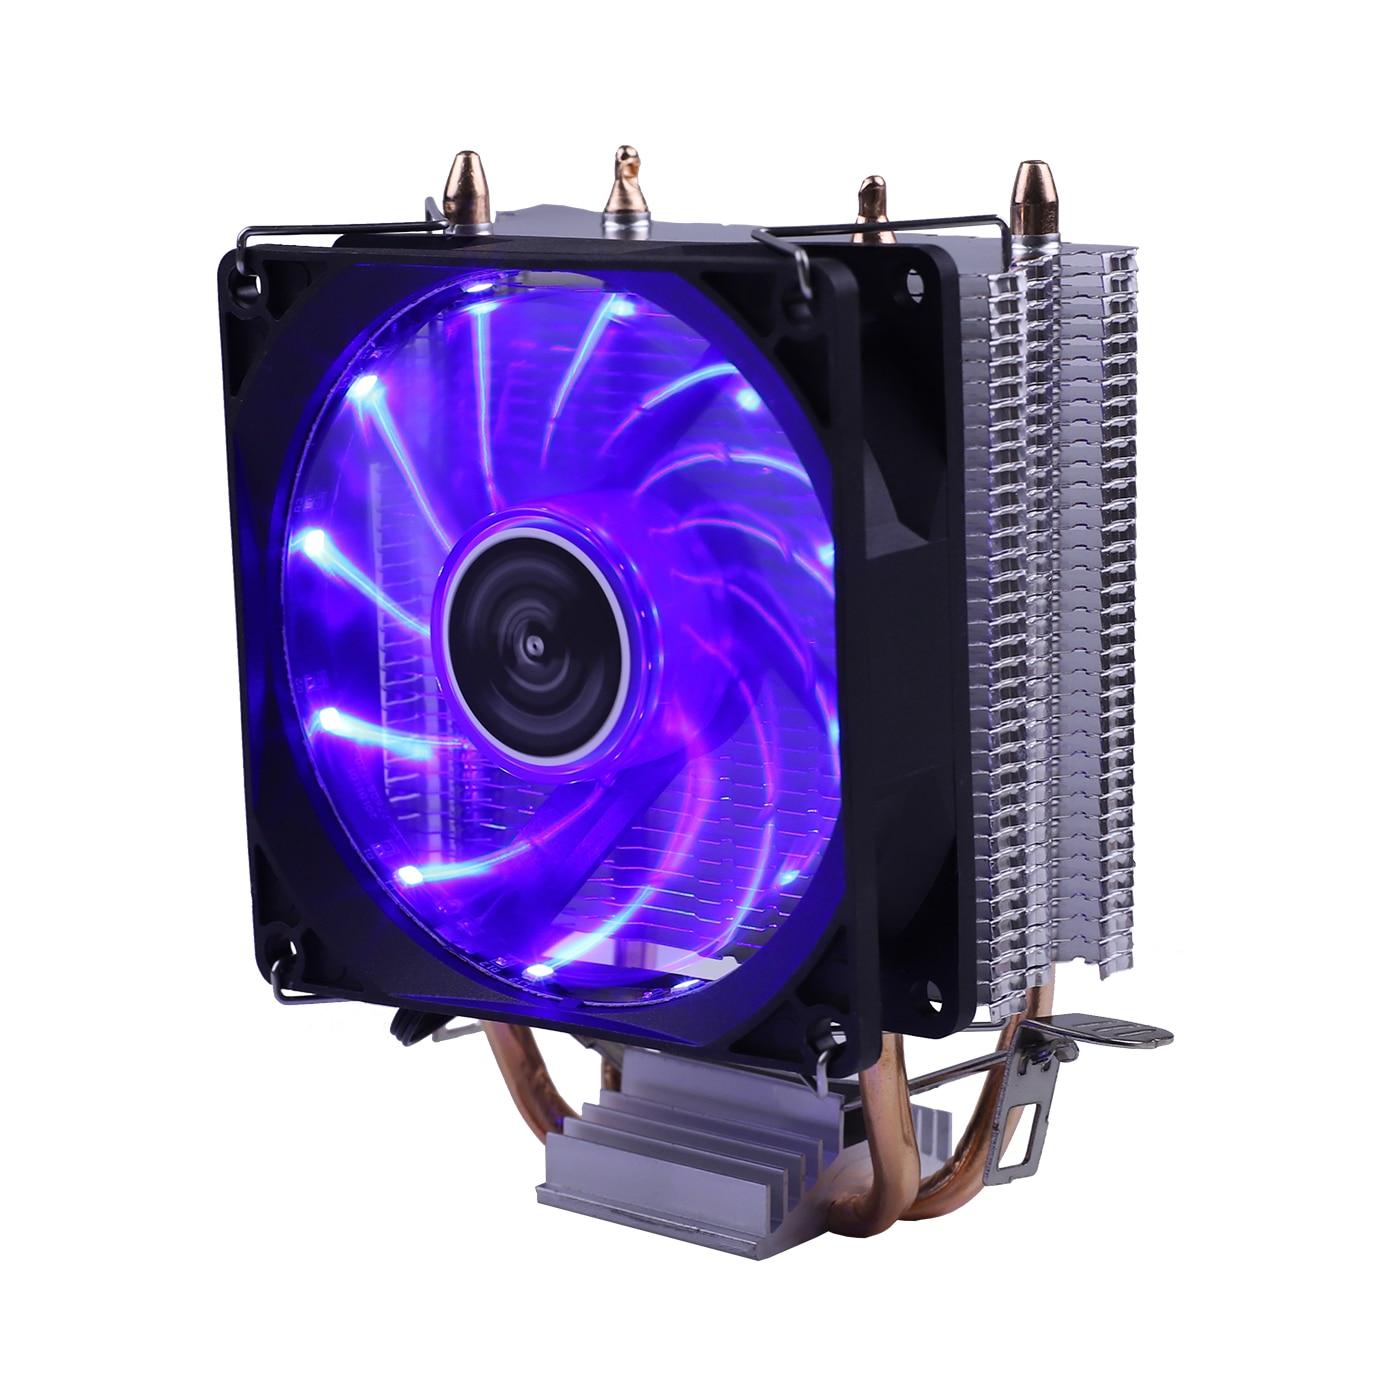 Efficient Cooling CPU Cooler Fan 3pin For Intel LGA 1150 1151 1155 1156 775 1200 AMD AM3 AM4 Quiet Ventilador Silent Radiator 4